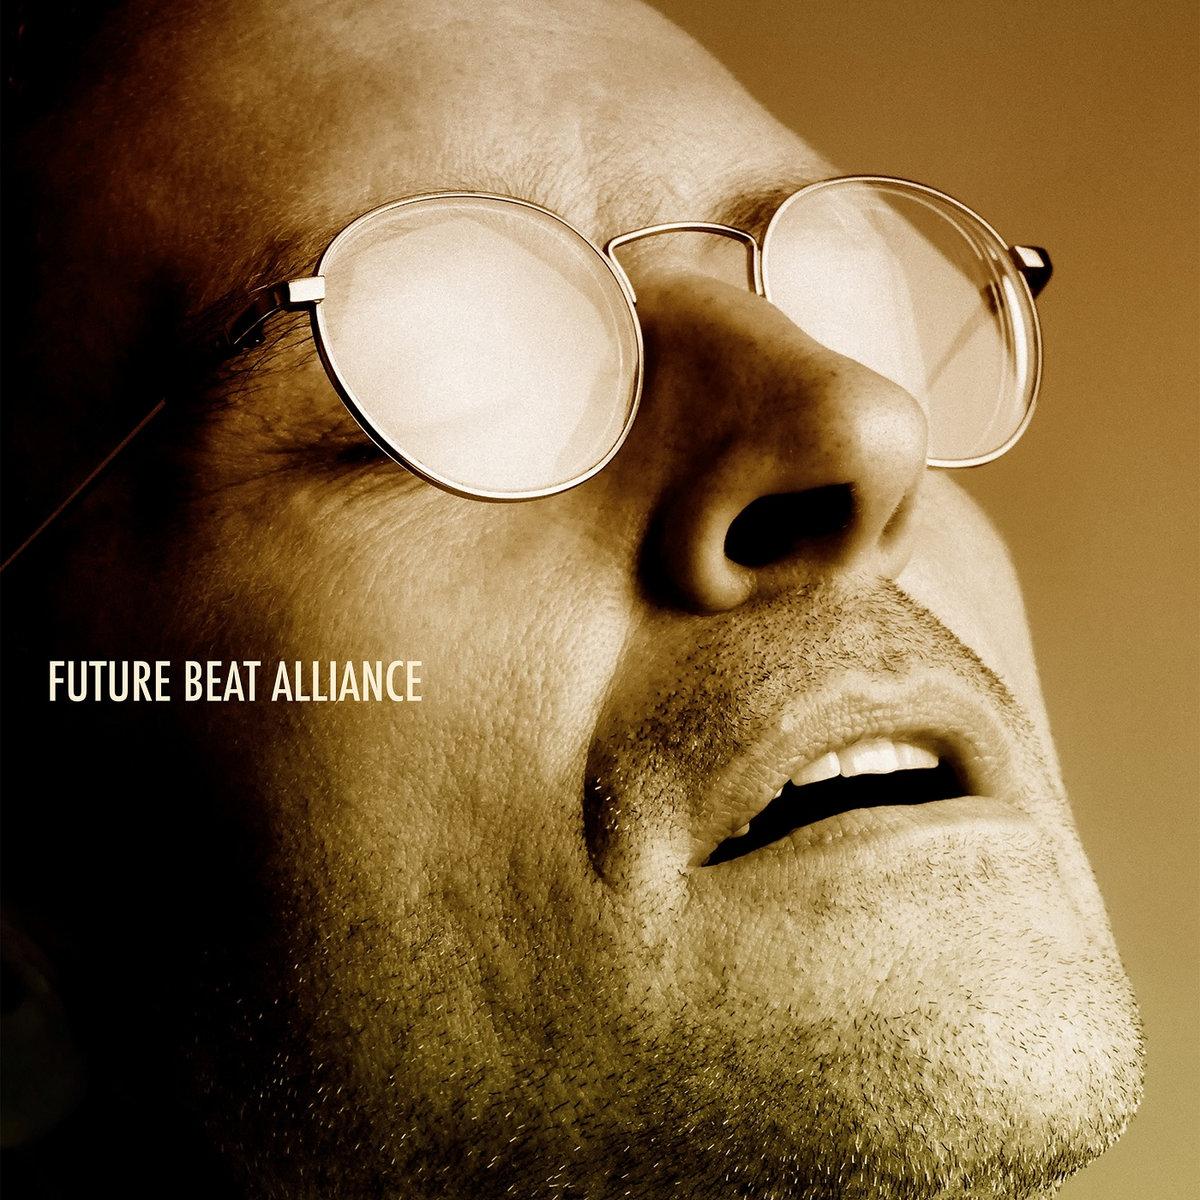 Future Beat Alliance - Collected Works 1996-2017 (Future Beat Alliance)